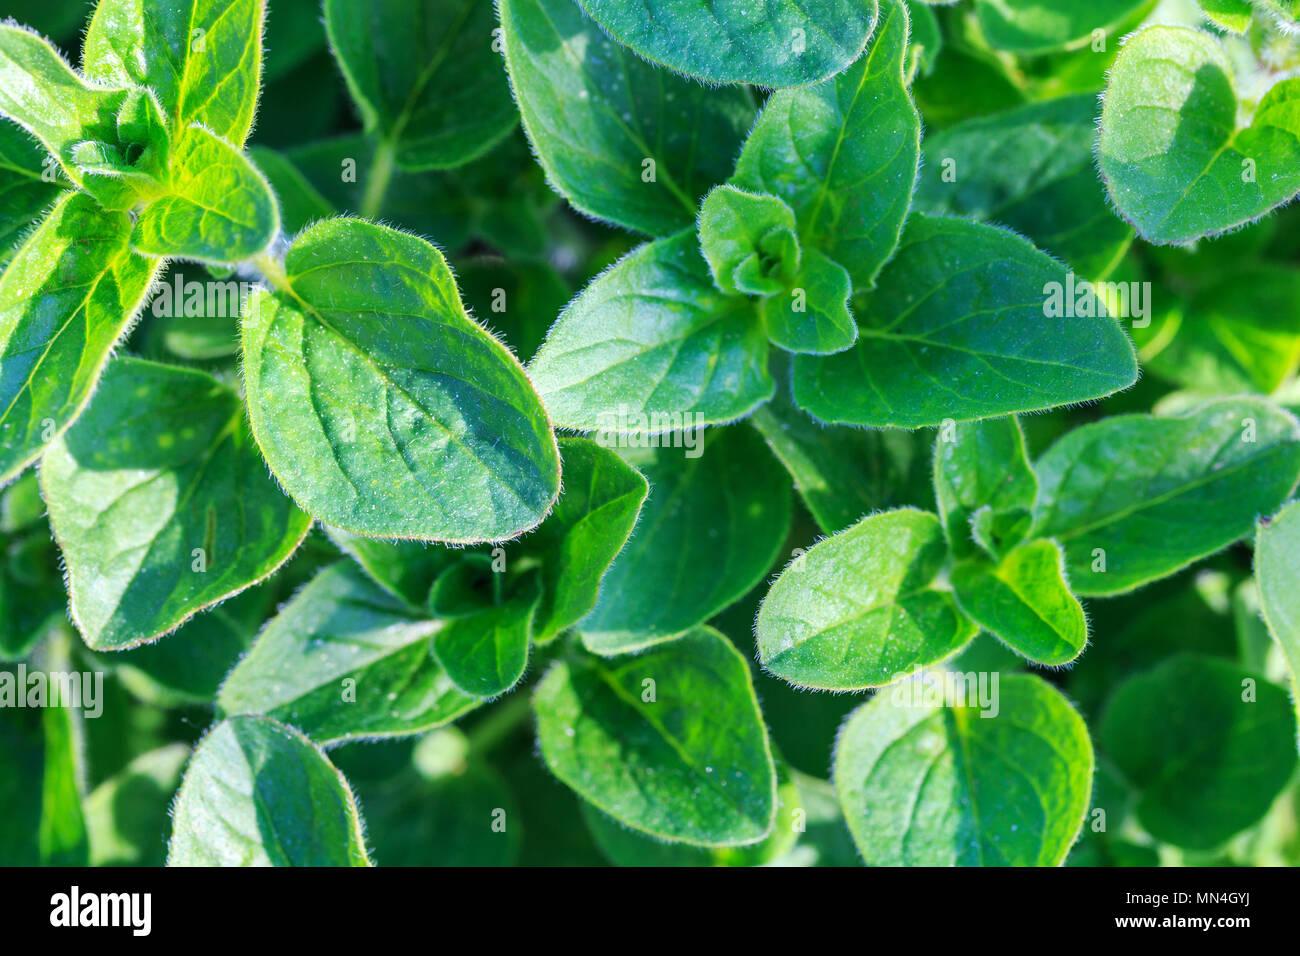 Fresh oregano growth in the garden - Stock Image